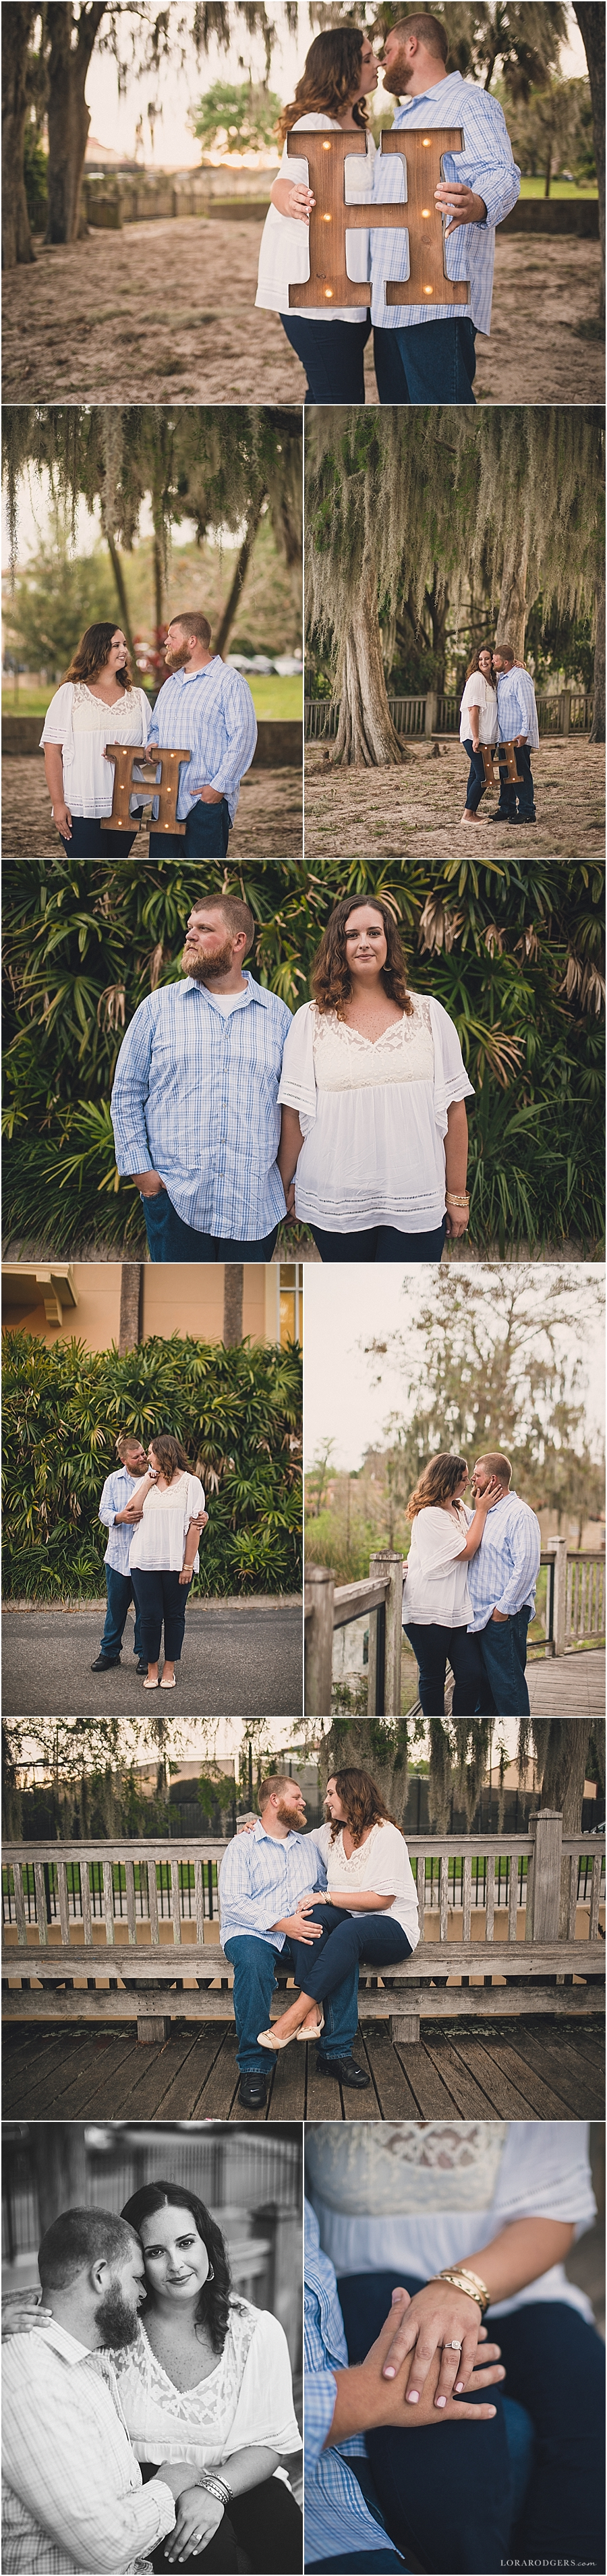 Rollins_College_Winter_Park_Florida_Engagement_005